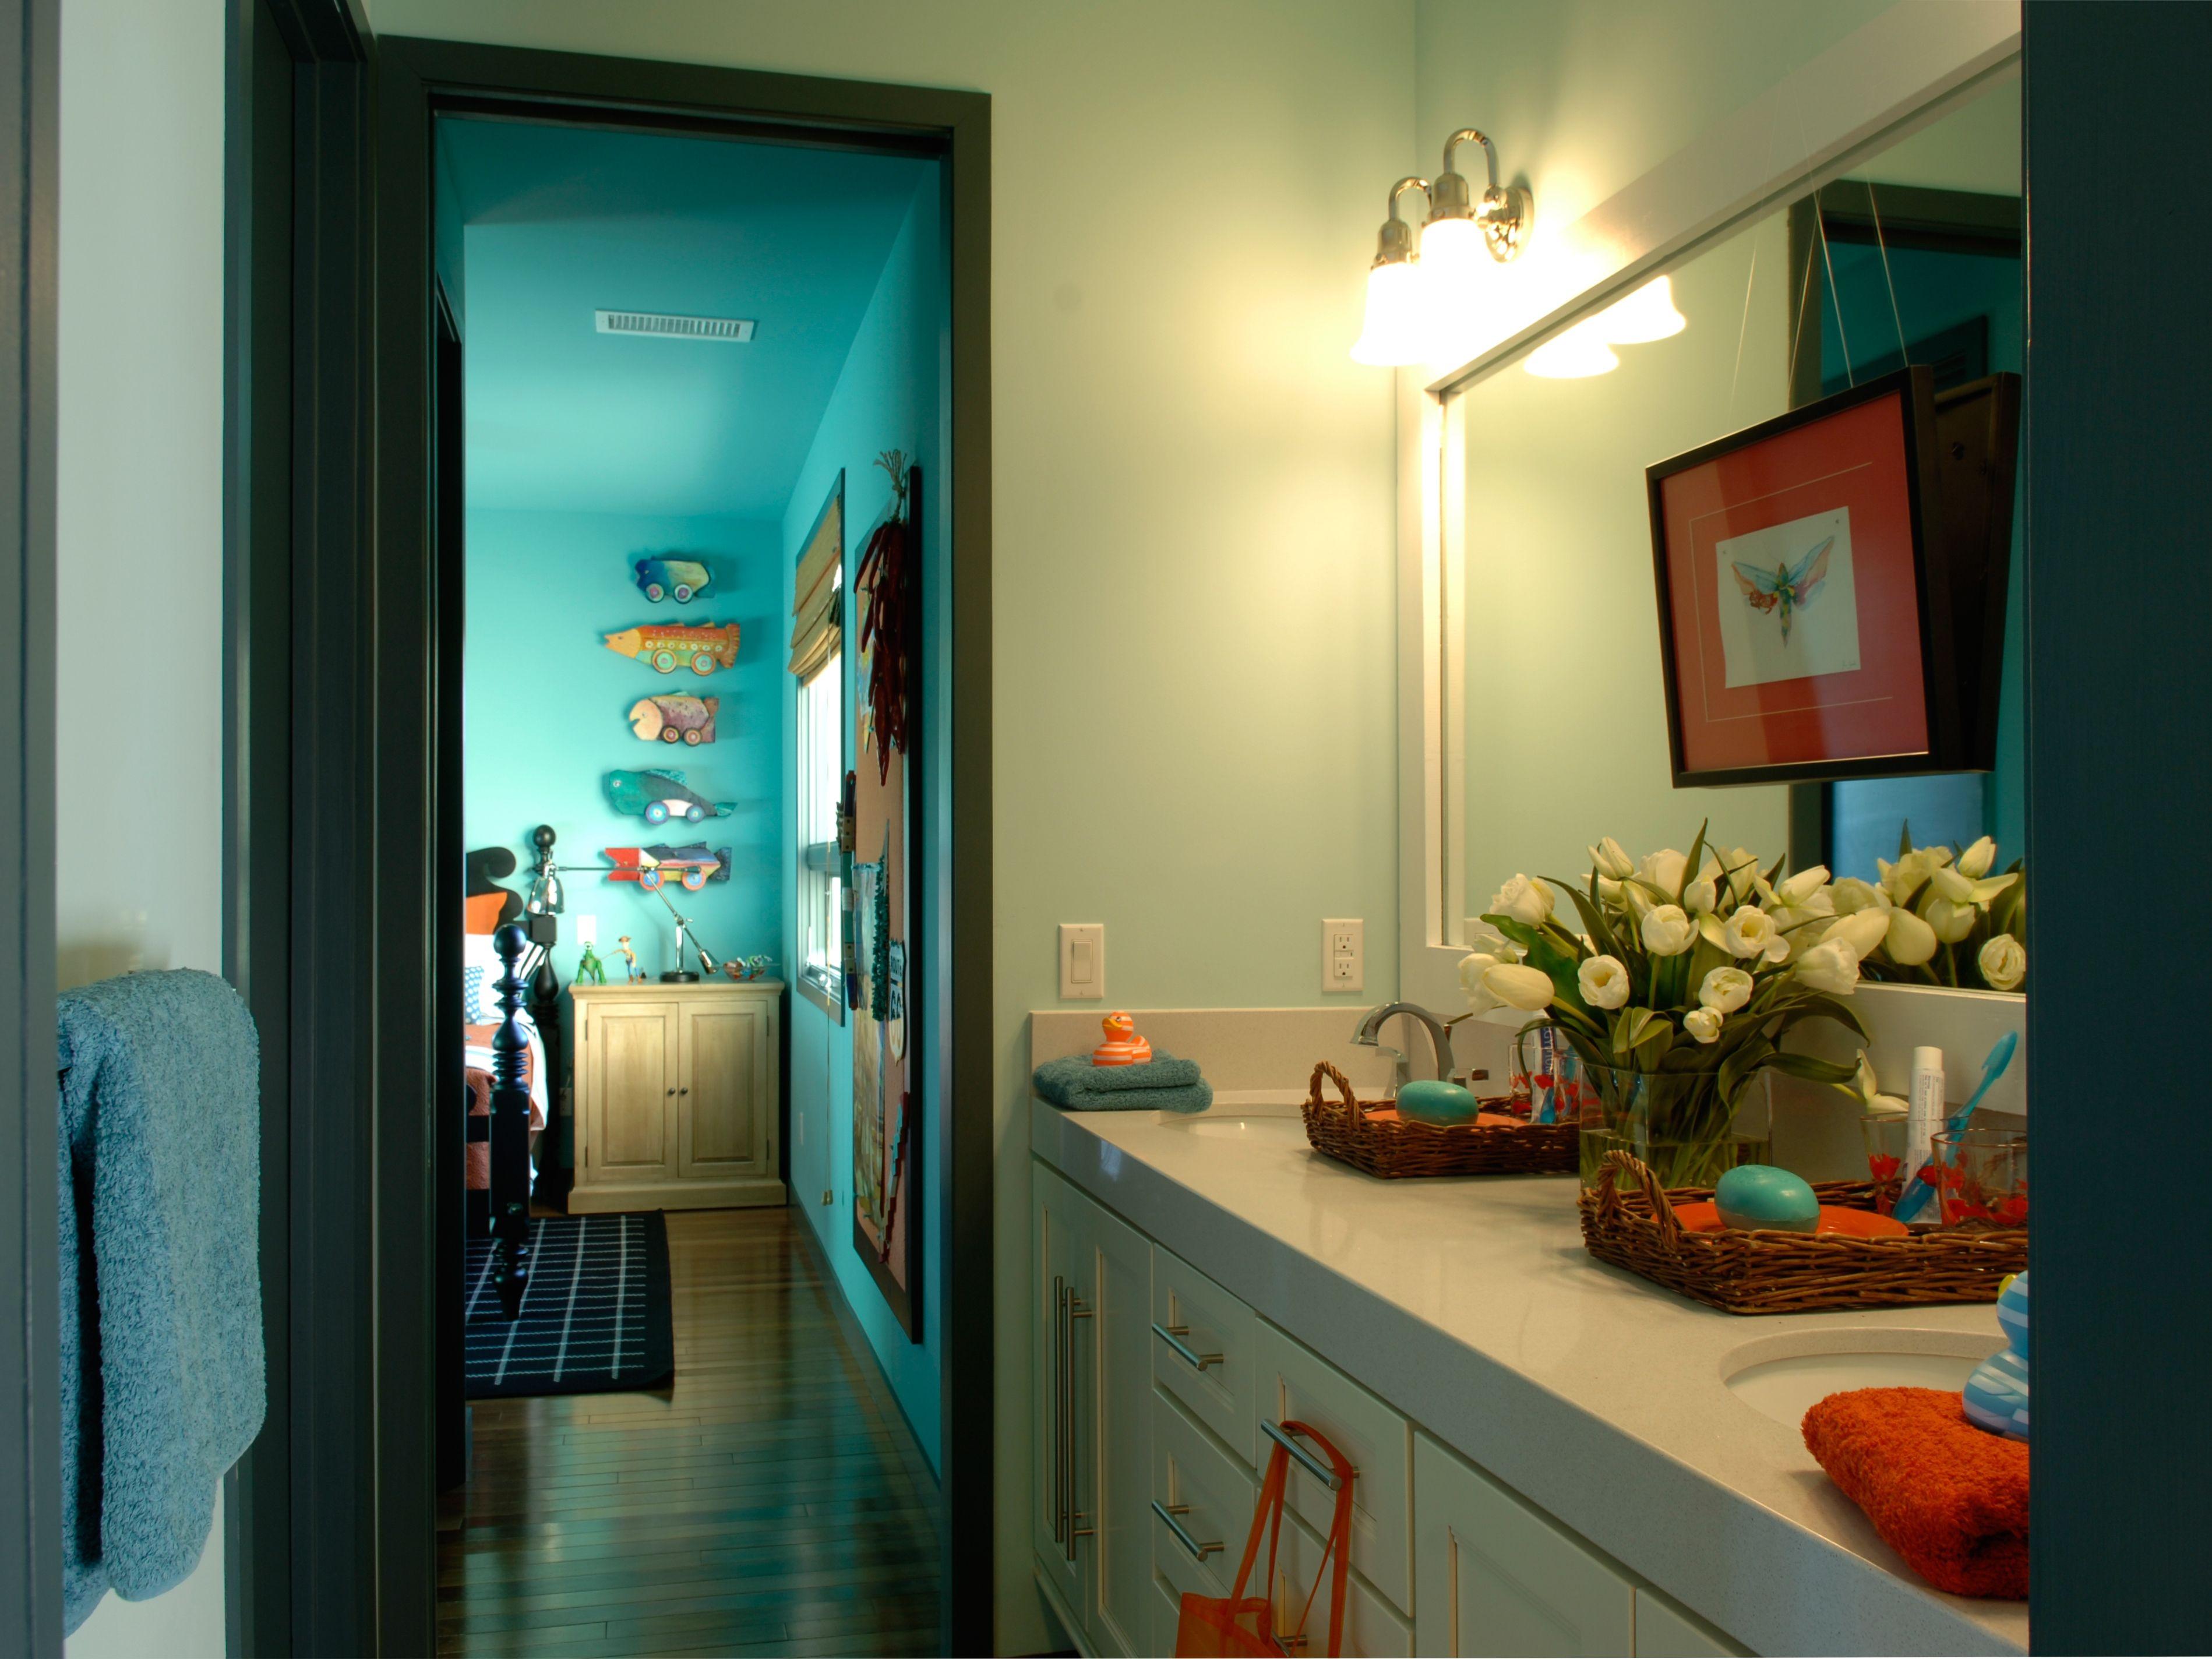 Boy And Girl Bathroom Ideas Extraordinary Jack And Jill Bathroom For Boy And Girl  Bathroom Ideas Inspiration